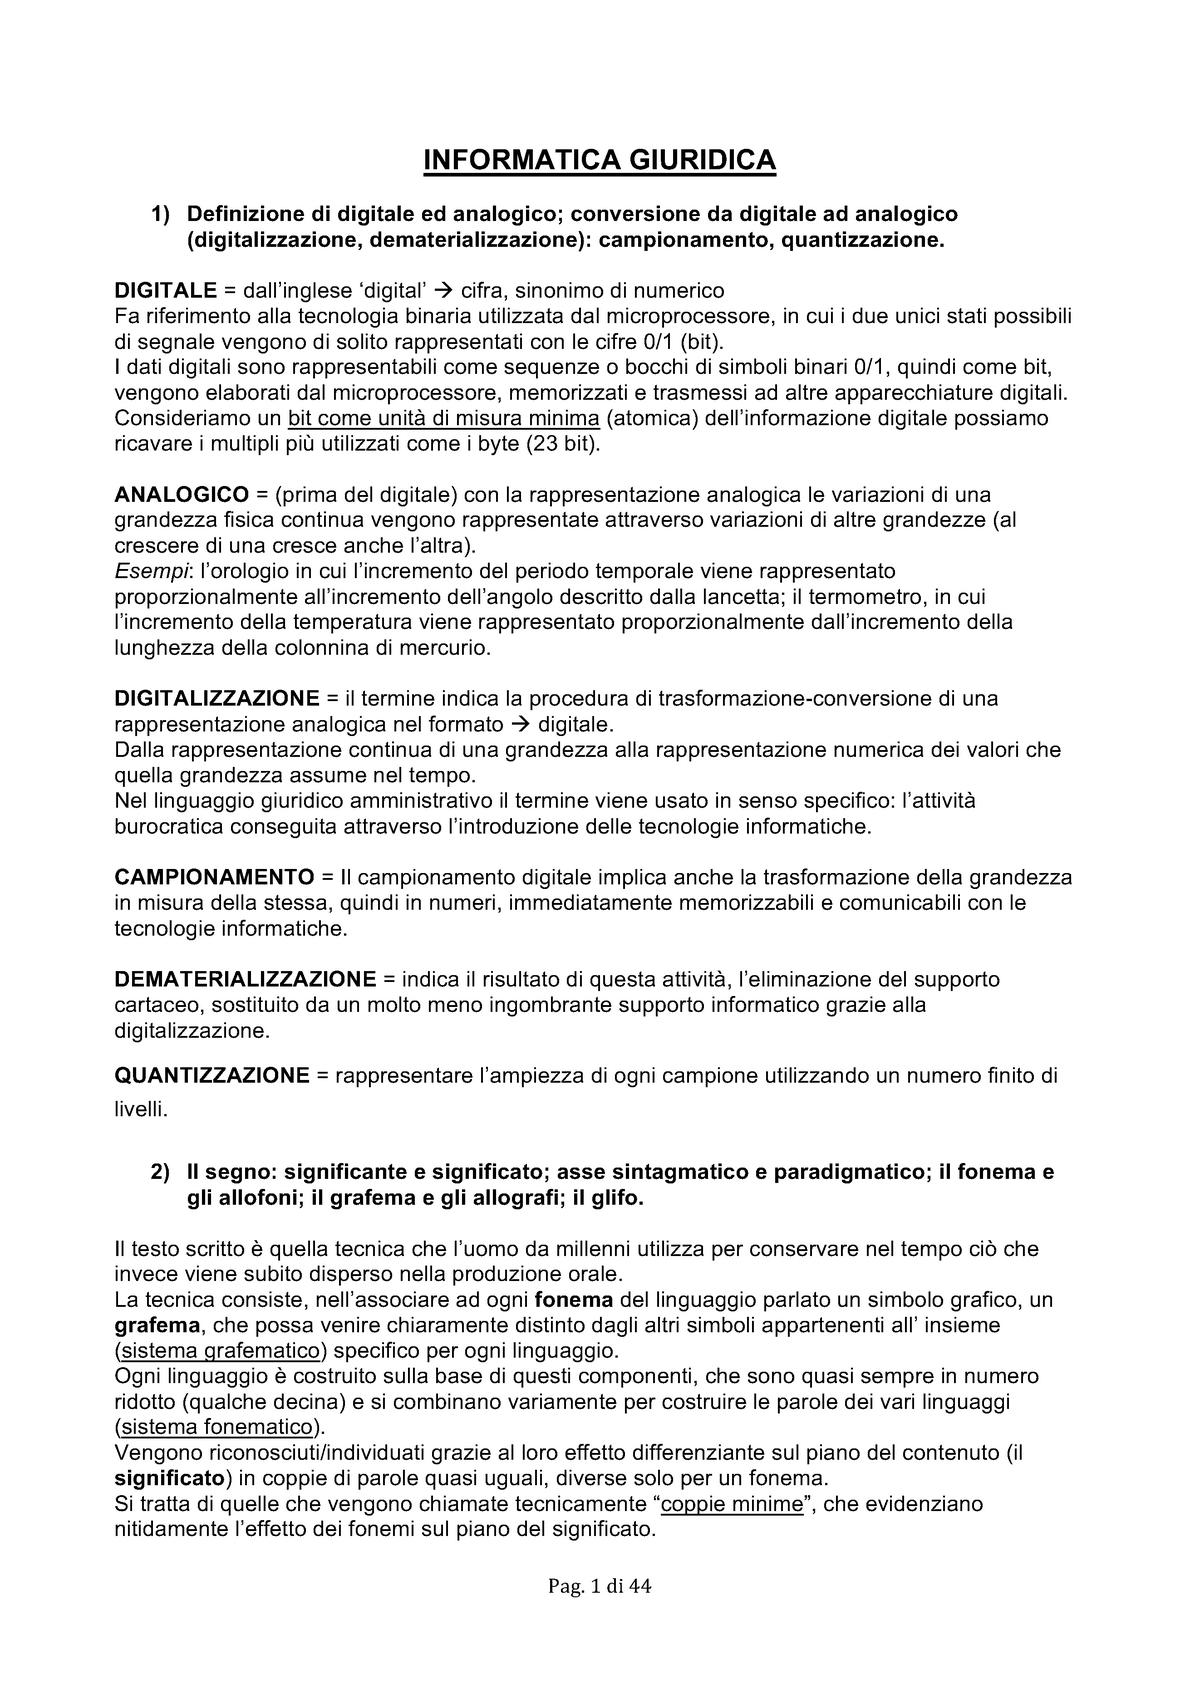 Syllabus Informatica Giuridica - 10706 - StuDocu